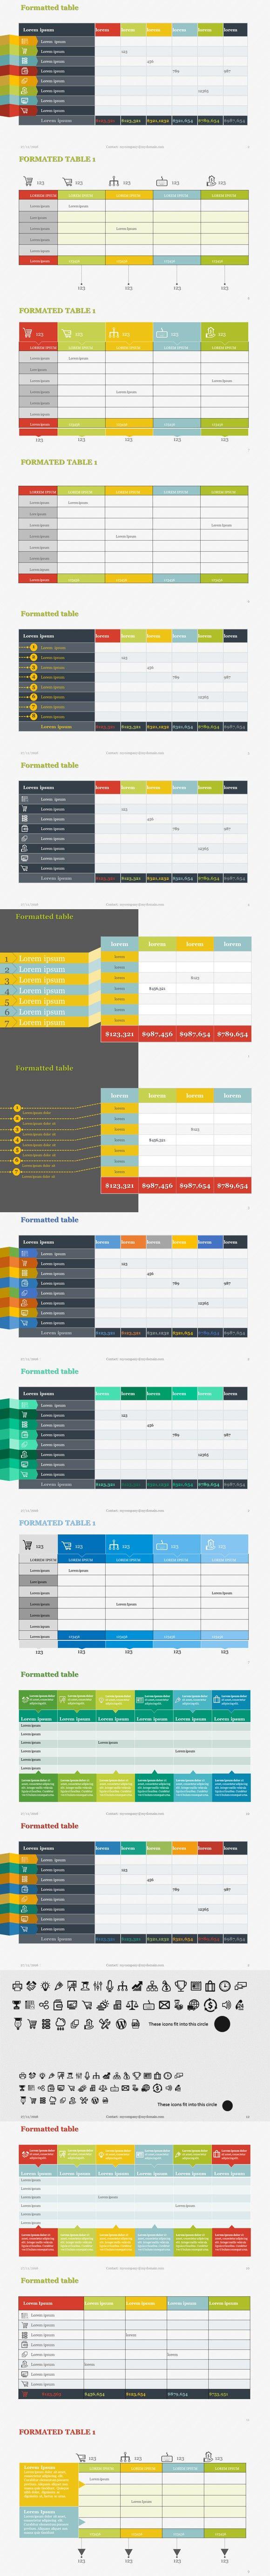 Poster design templates powerpoint - Creative Tables Pack 1 Powerpoint Powerpoint Posterposter Templatespresentation Templatesinfographics